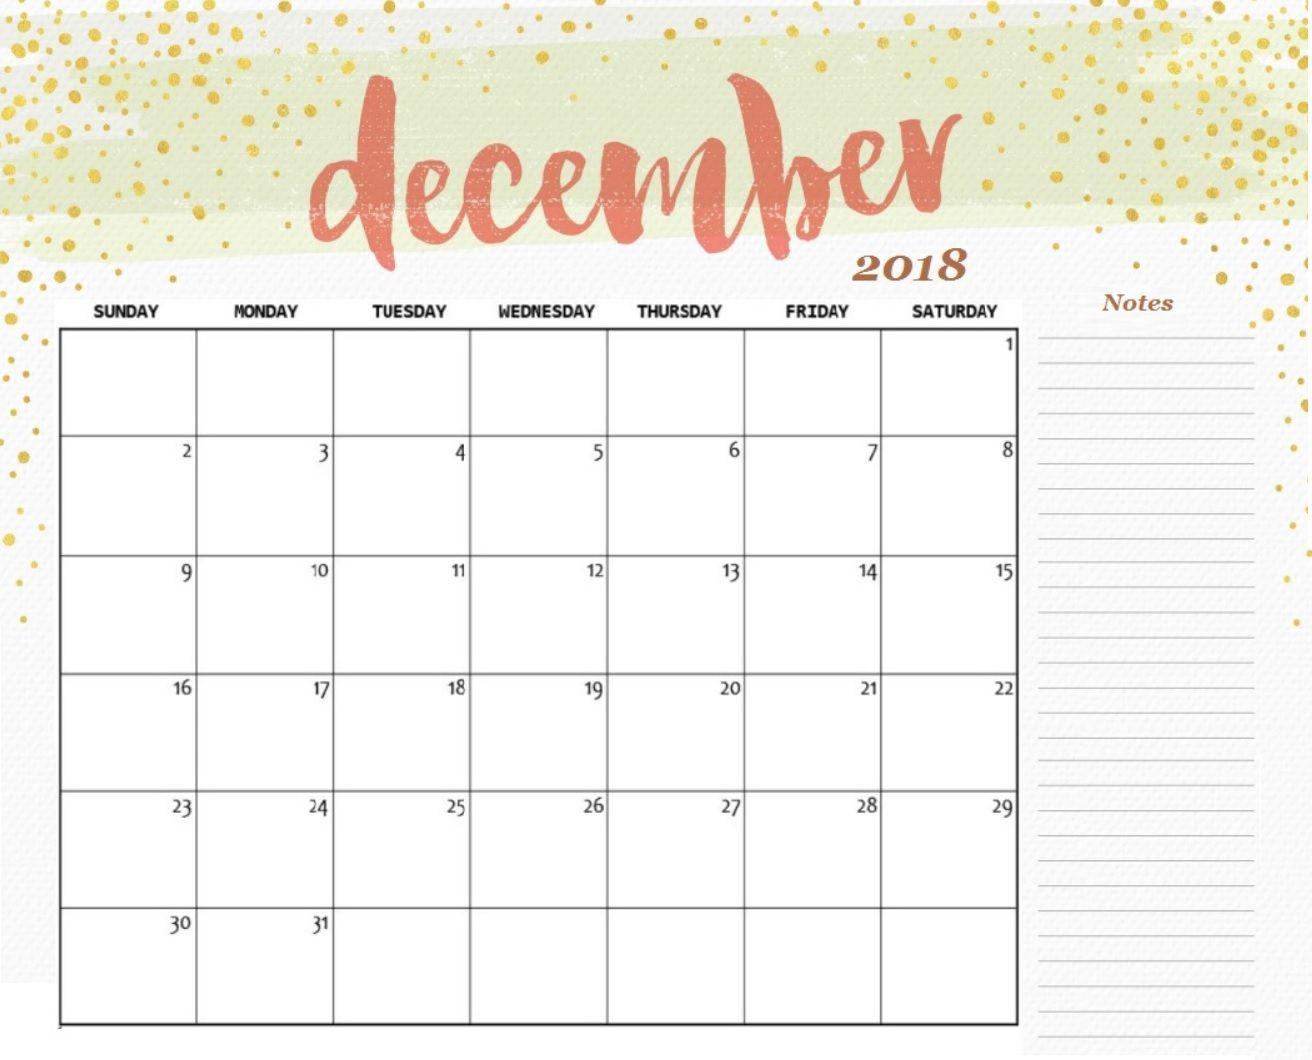 December 2018 Calendar Printable Template | 100+ December 2018 with December Blank Monthly Calendar